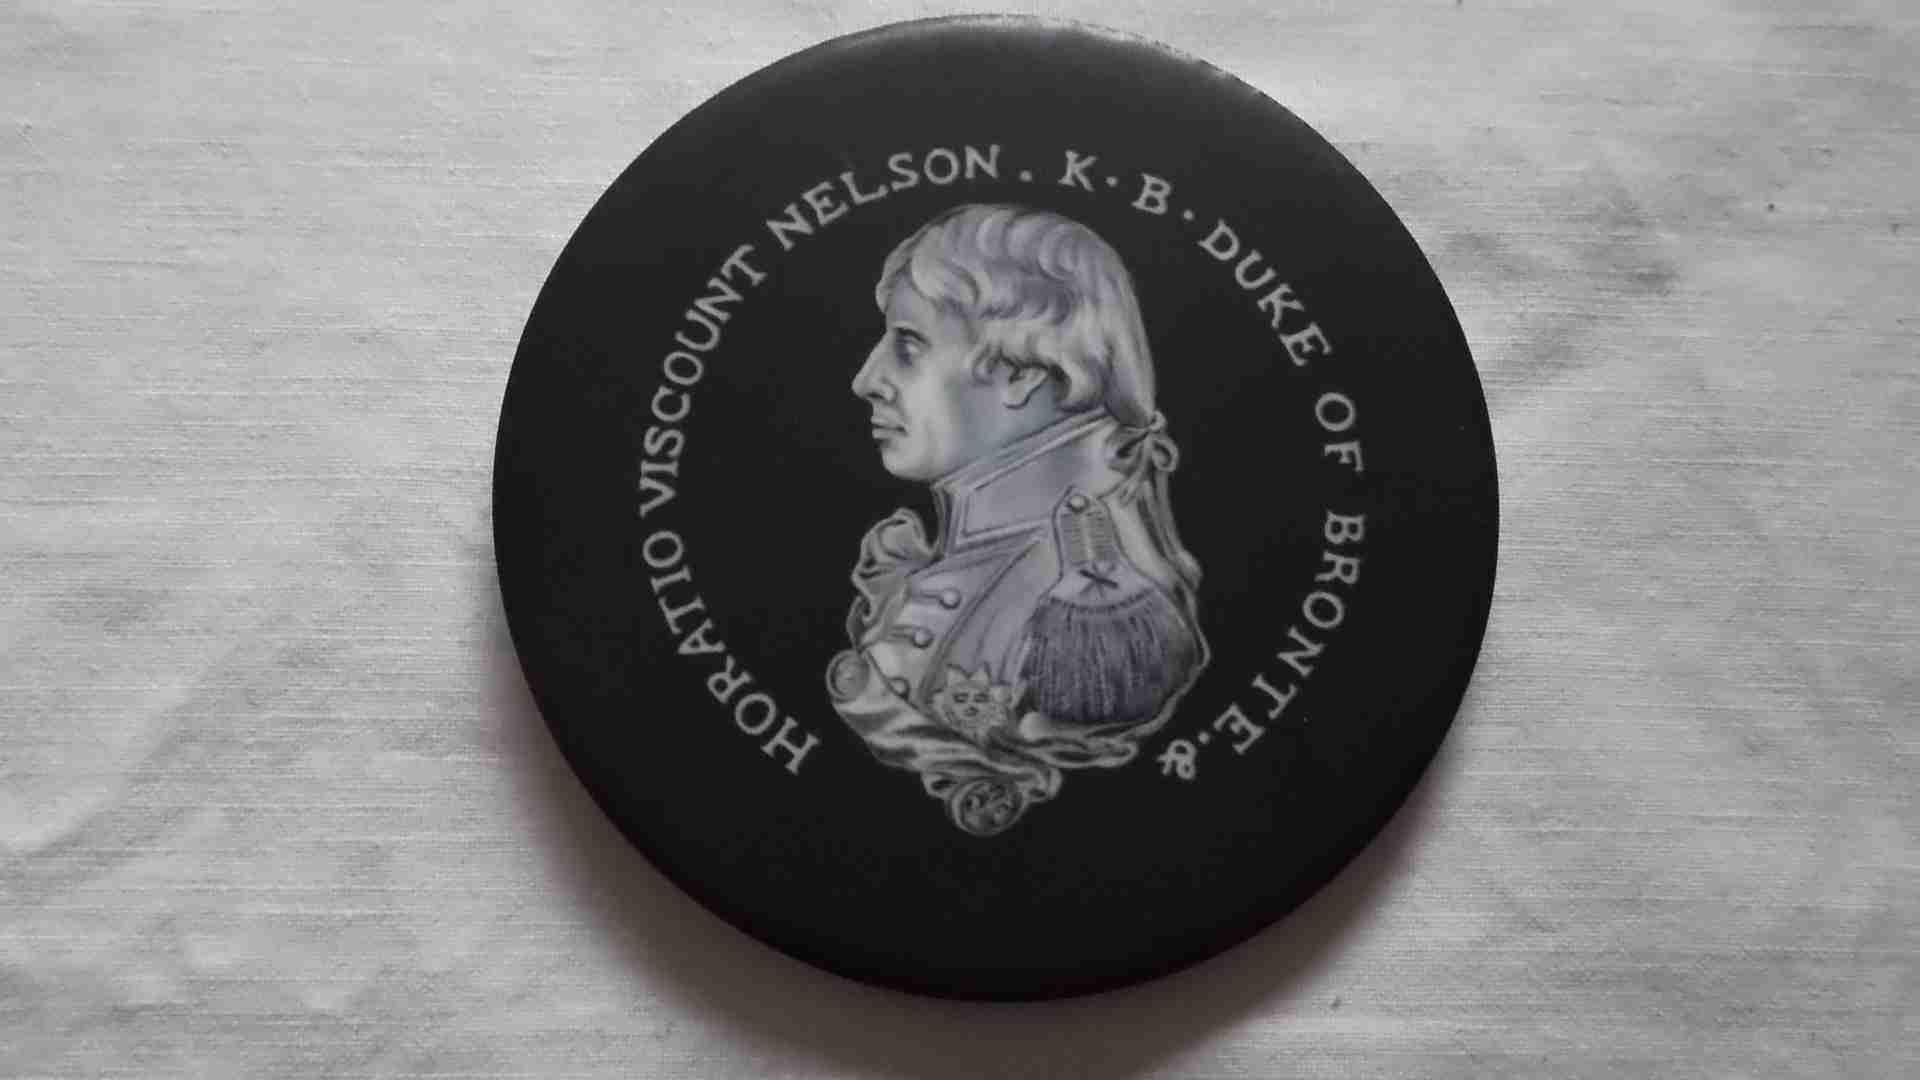 SOUVENIR COASTER MAT OF LORD HORAIO NELSON